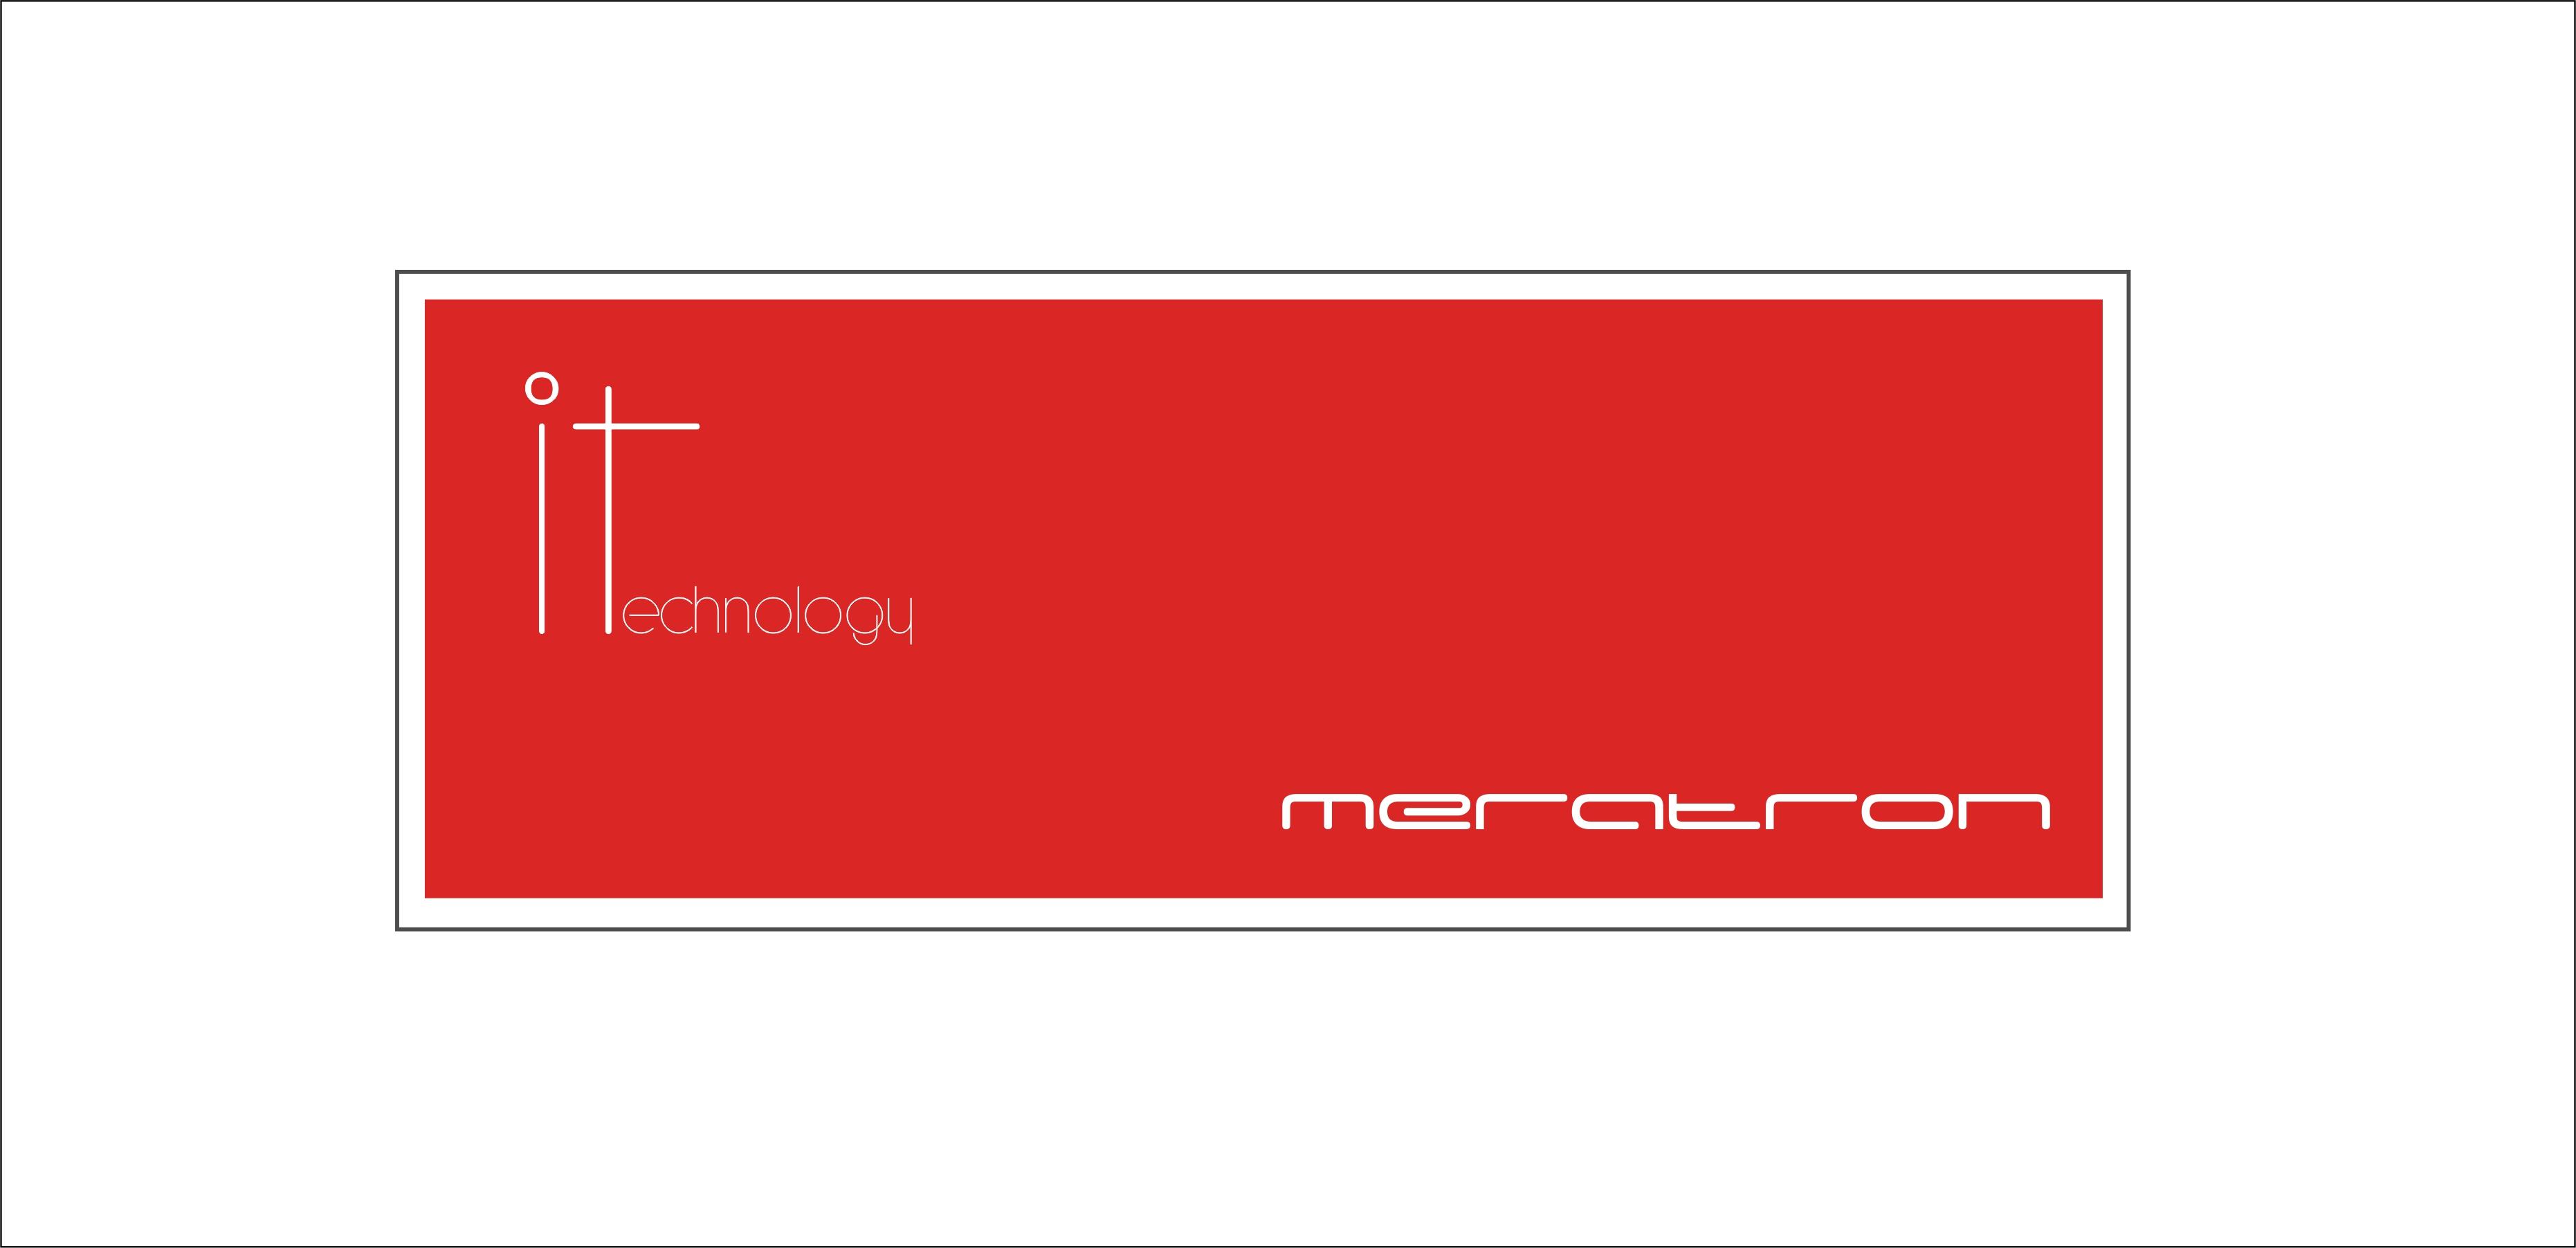 Разработать логотип организации фото f_4f0edbcfd477f.jpg